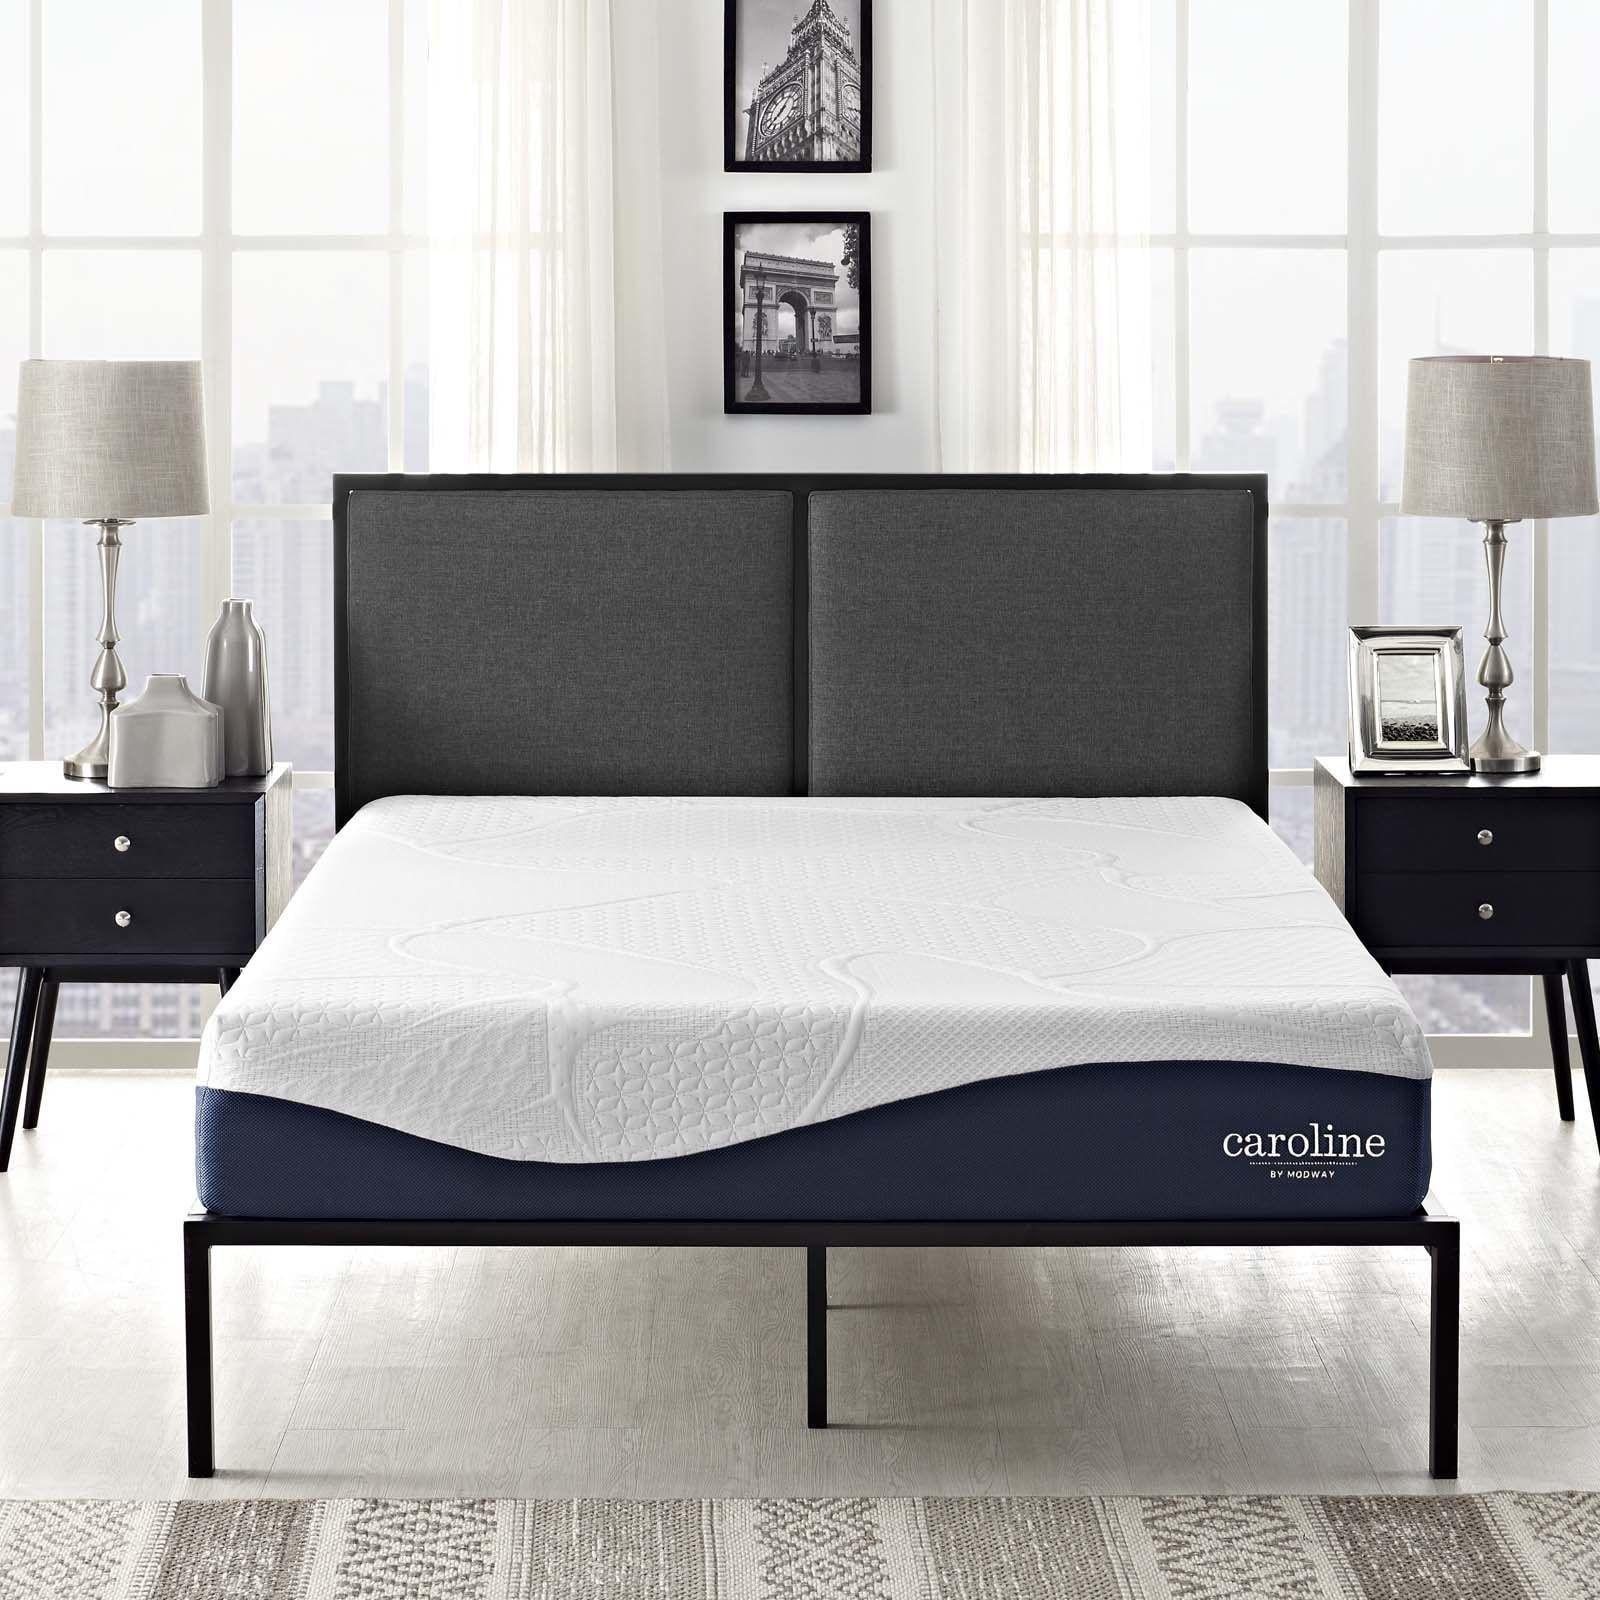 Caroline 10inch Memory Foam Mattress Foam mattress